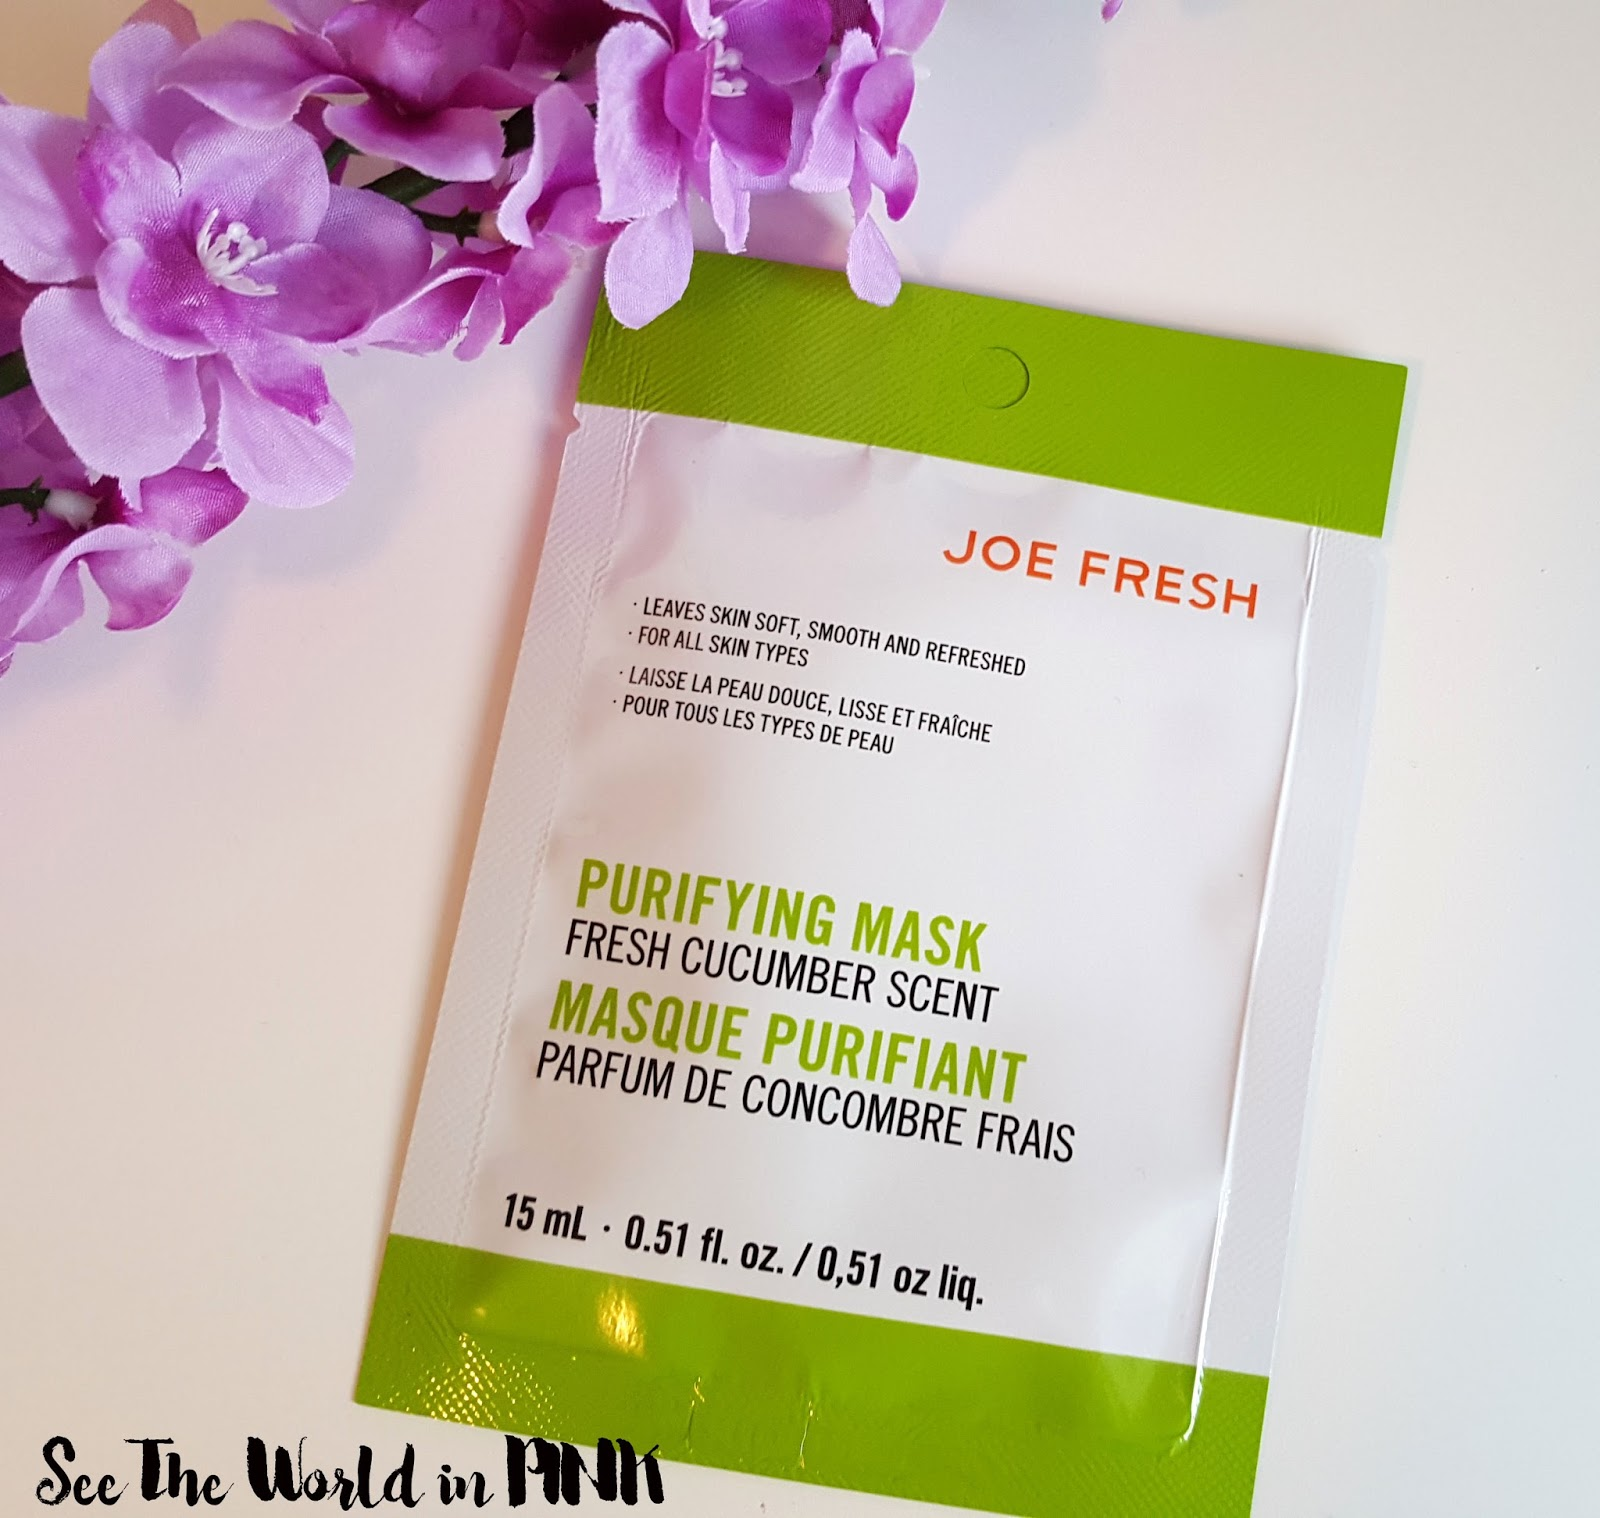 Joe Fresh Purifying Mask Fresh Cucumber Scent Review